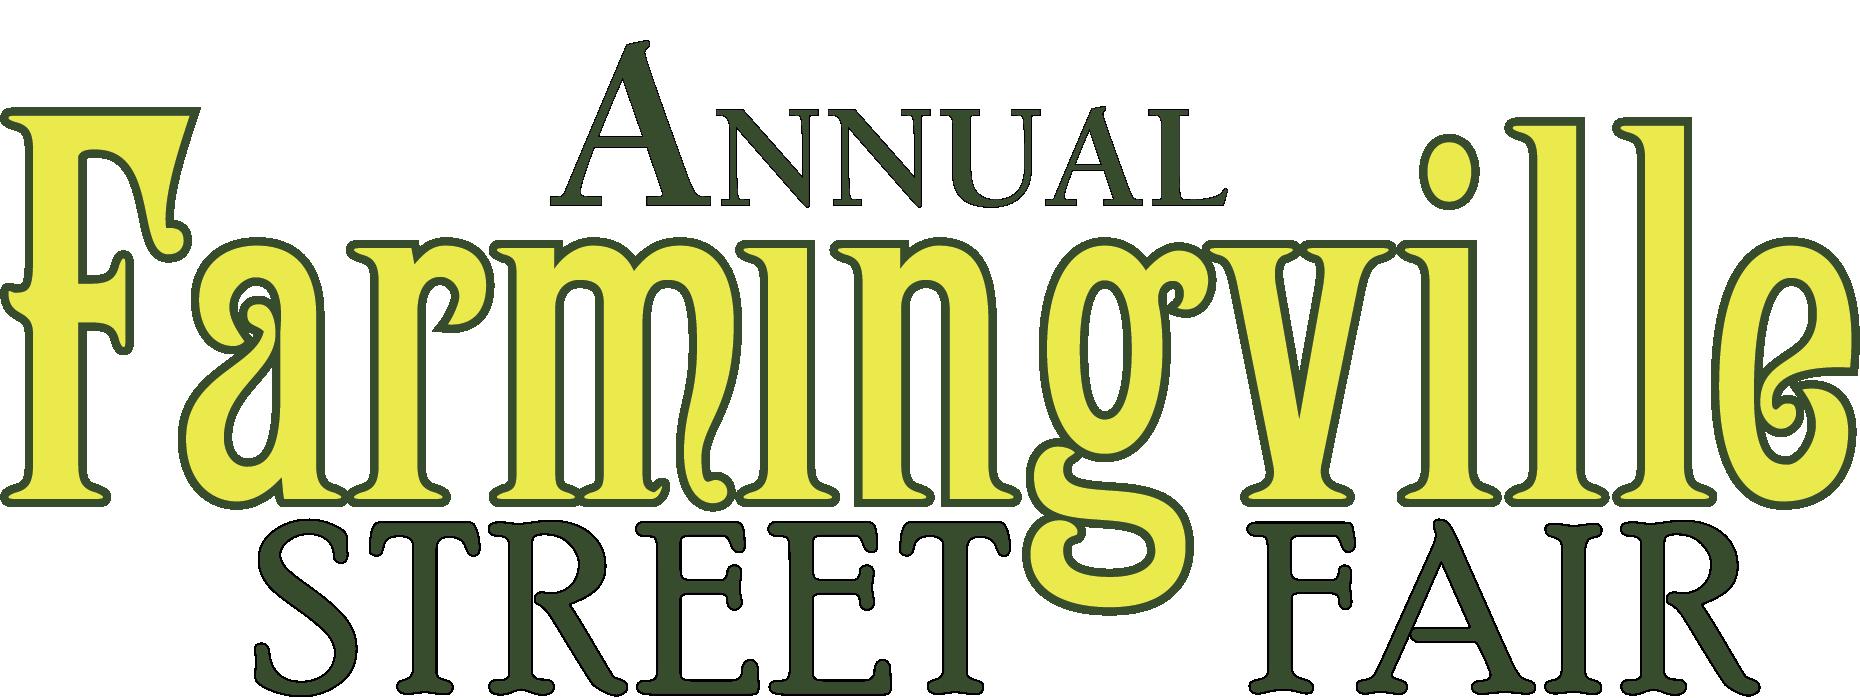 Farmingville Street Fair logo